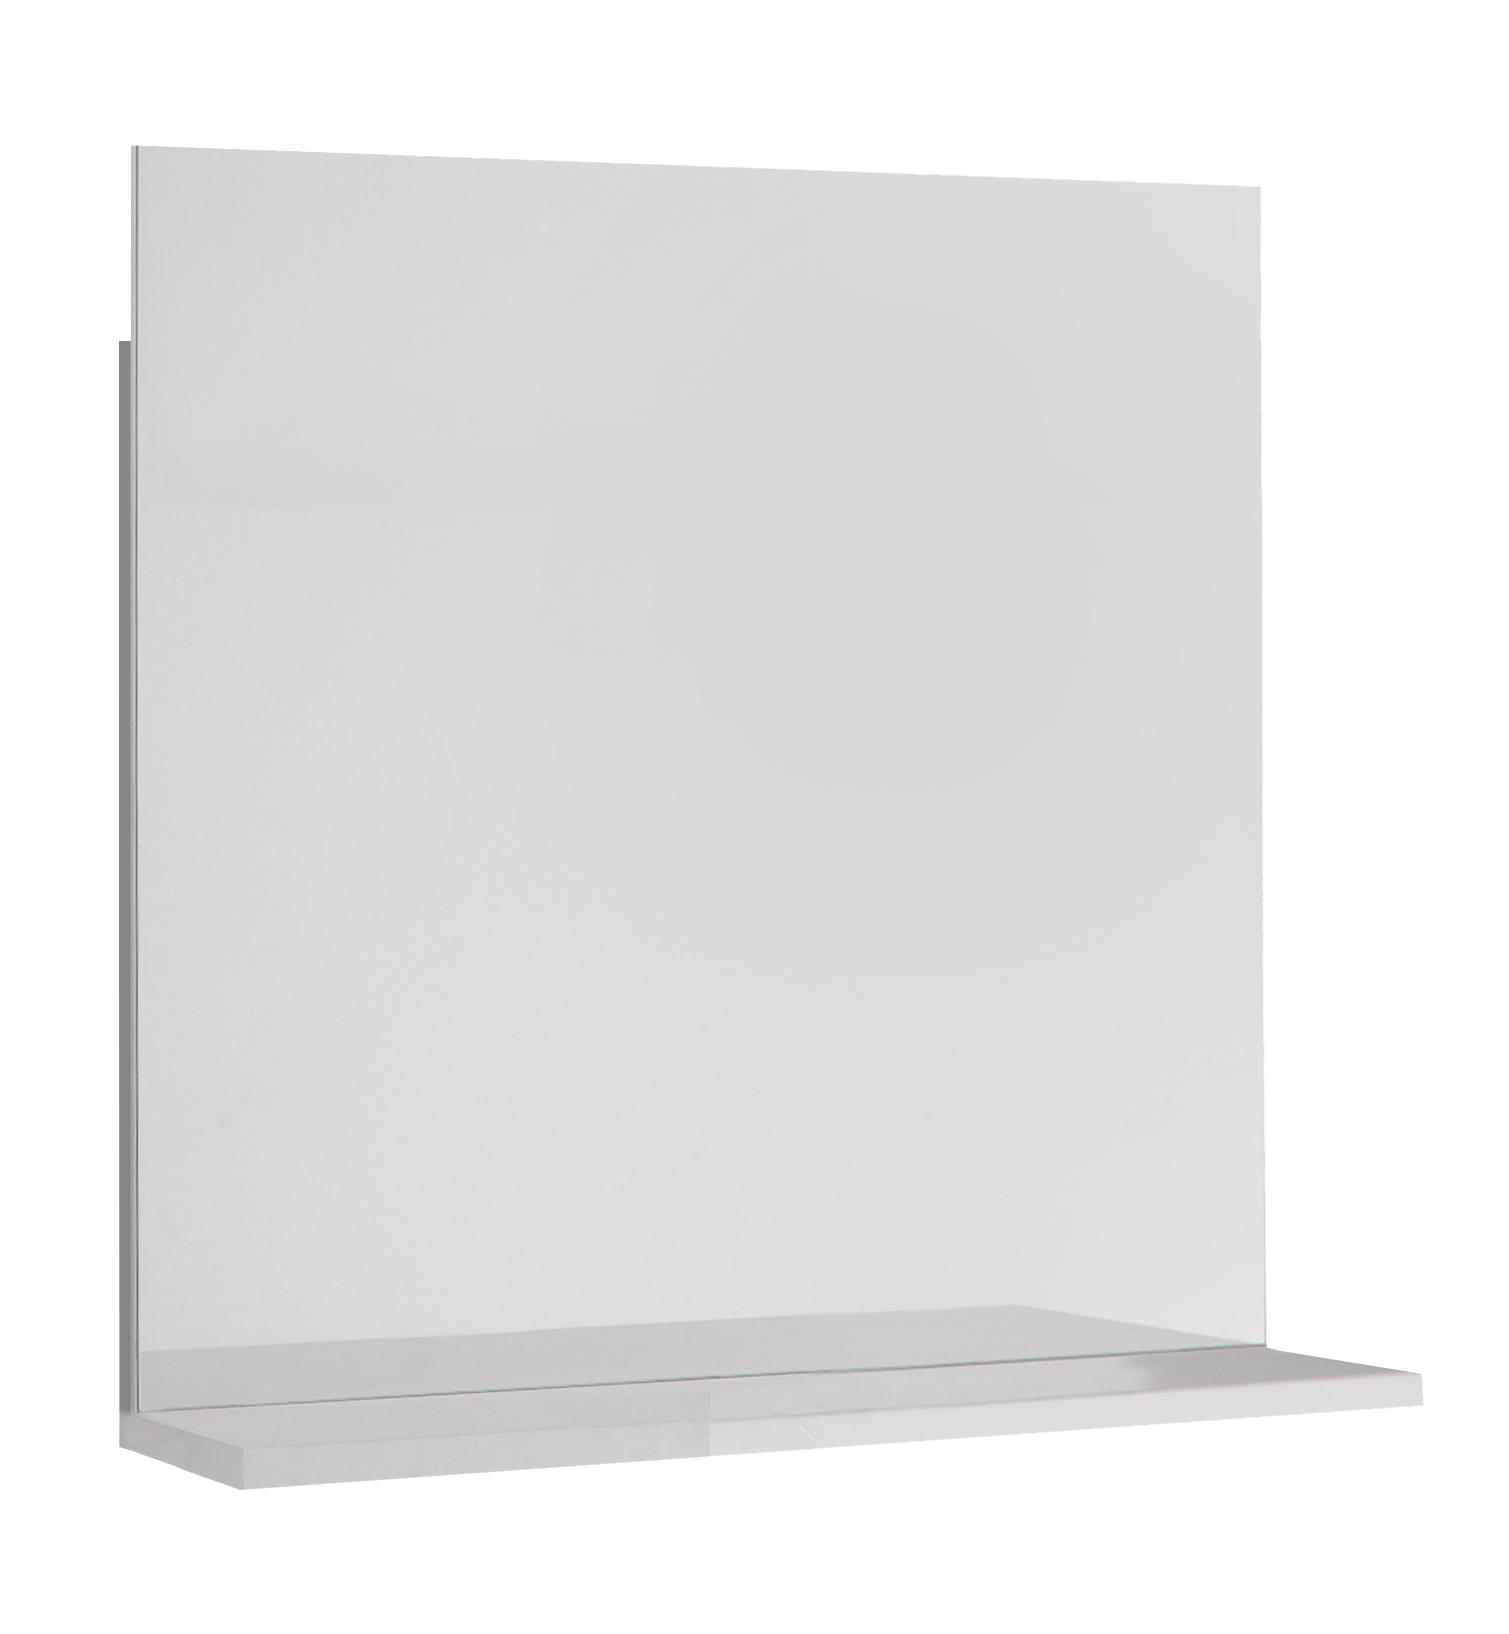 Miroir de salle de bain miroir decotab aquarine for Miroir 60 cm